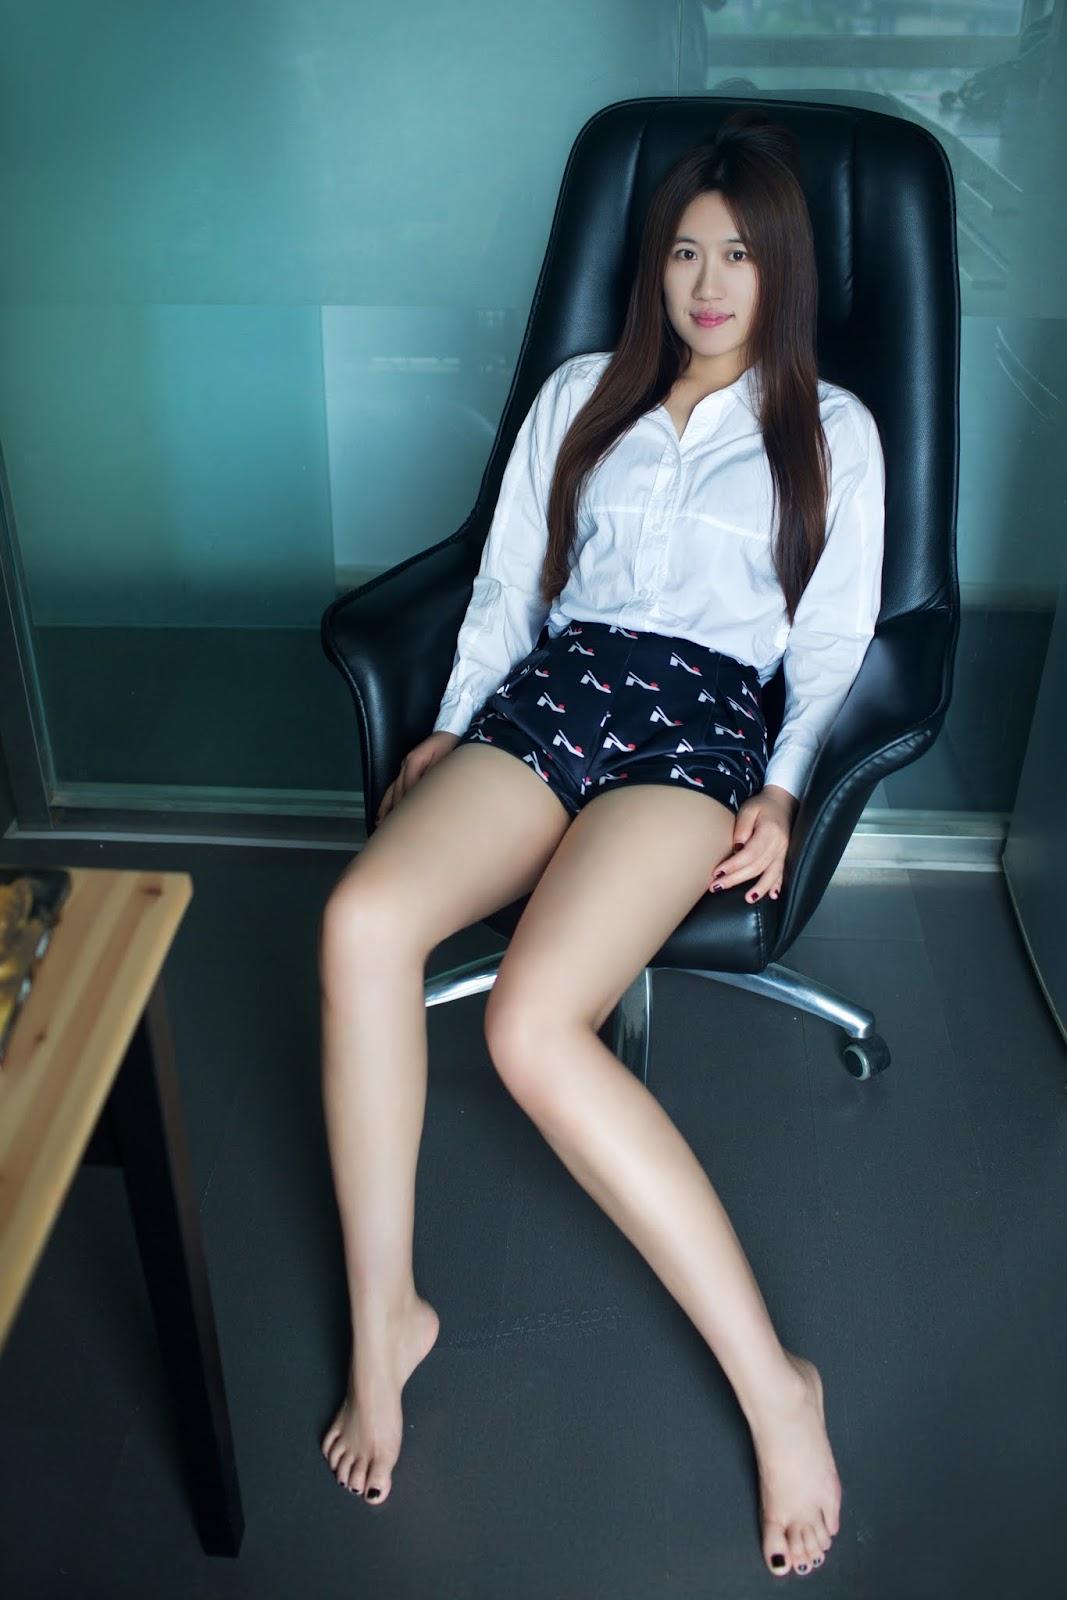 Jessica%2B%25285%2529 - TuiGirl No.60